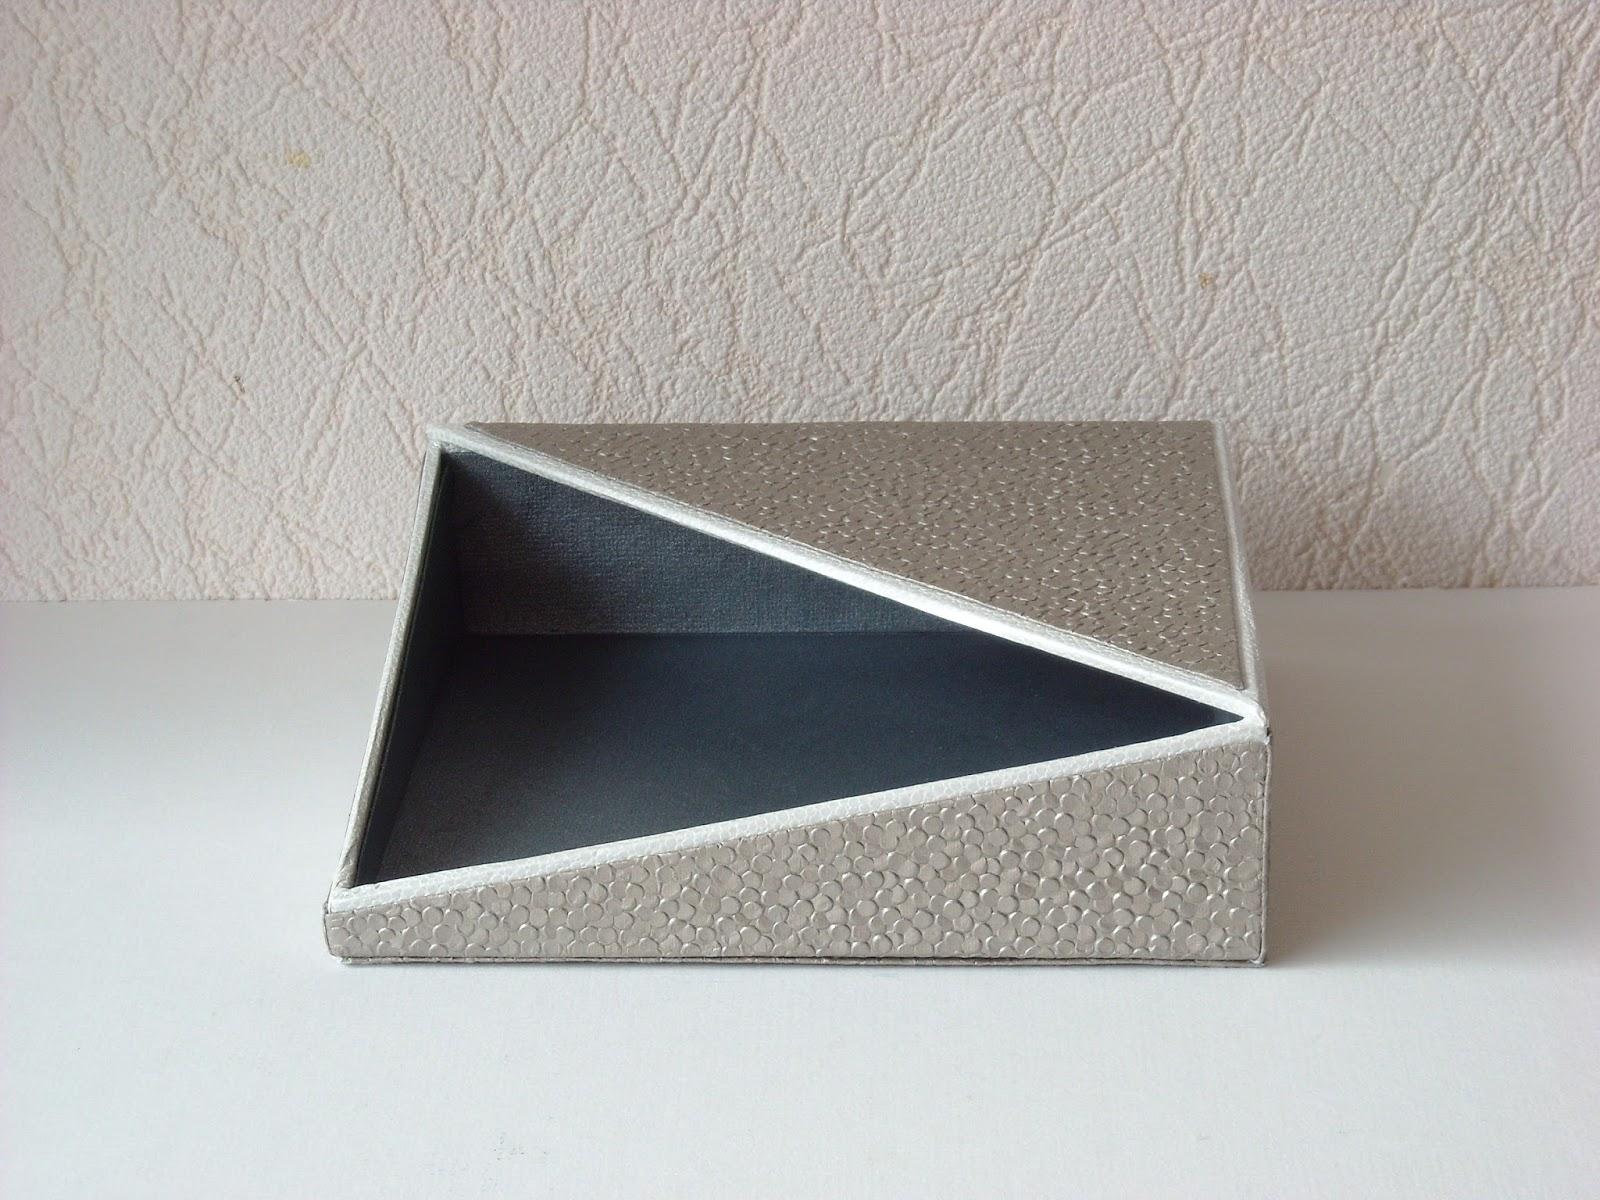 patchwork cartonnage porte serviettes. Black Bedroom Furniture Sets. Home Design Ideas